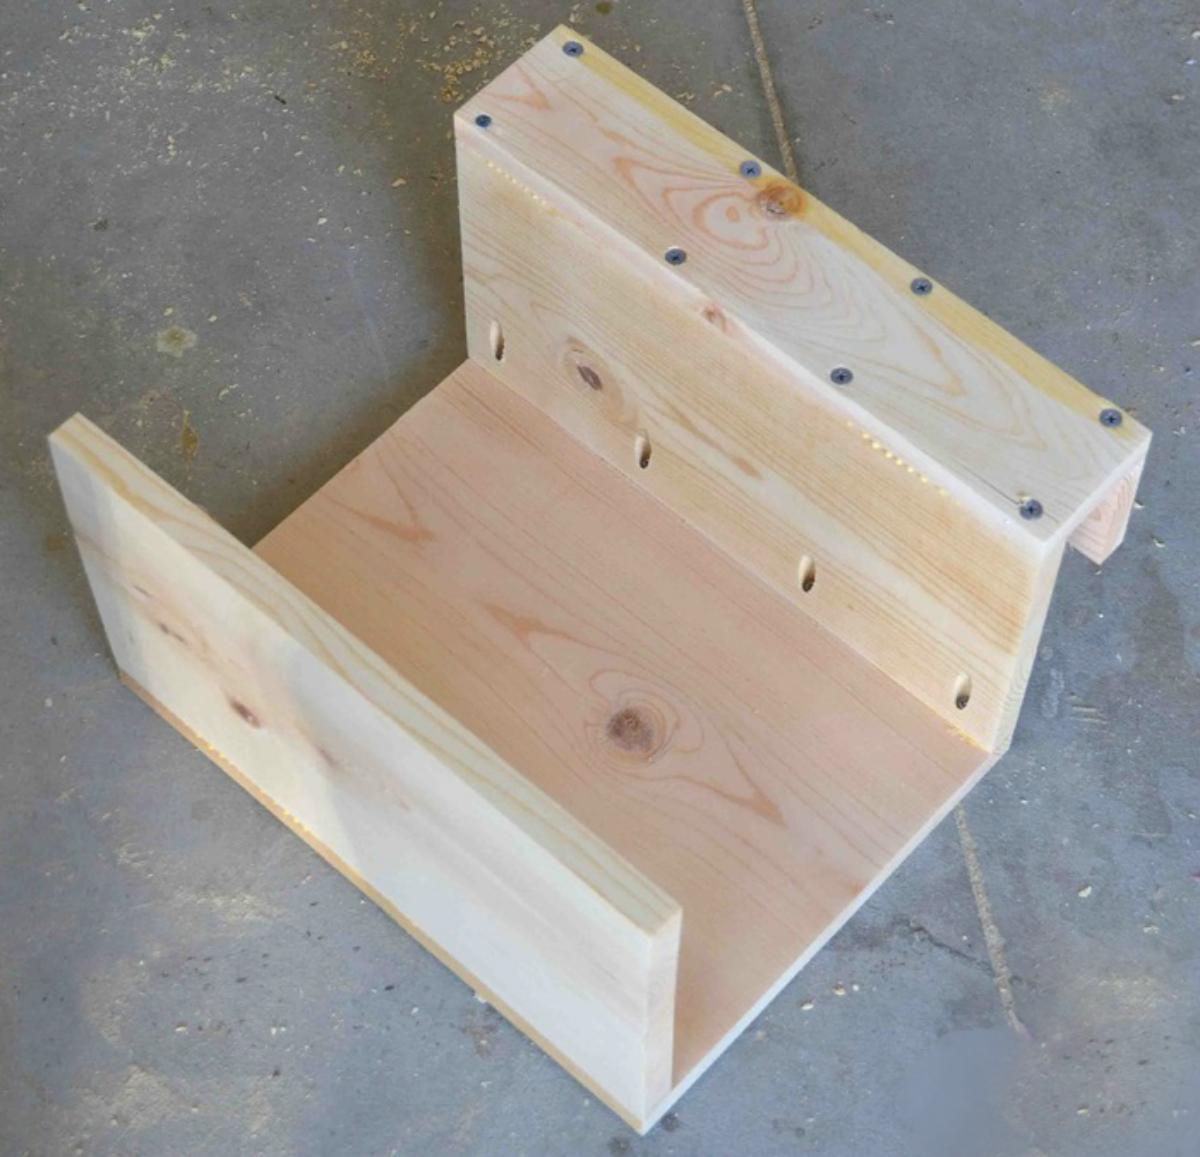 накладка на подлокотник дивана своими руками